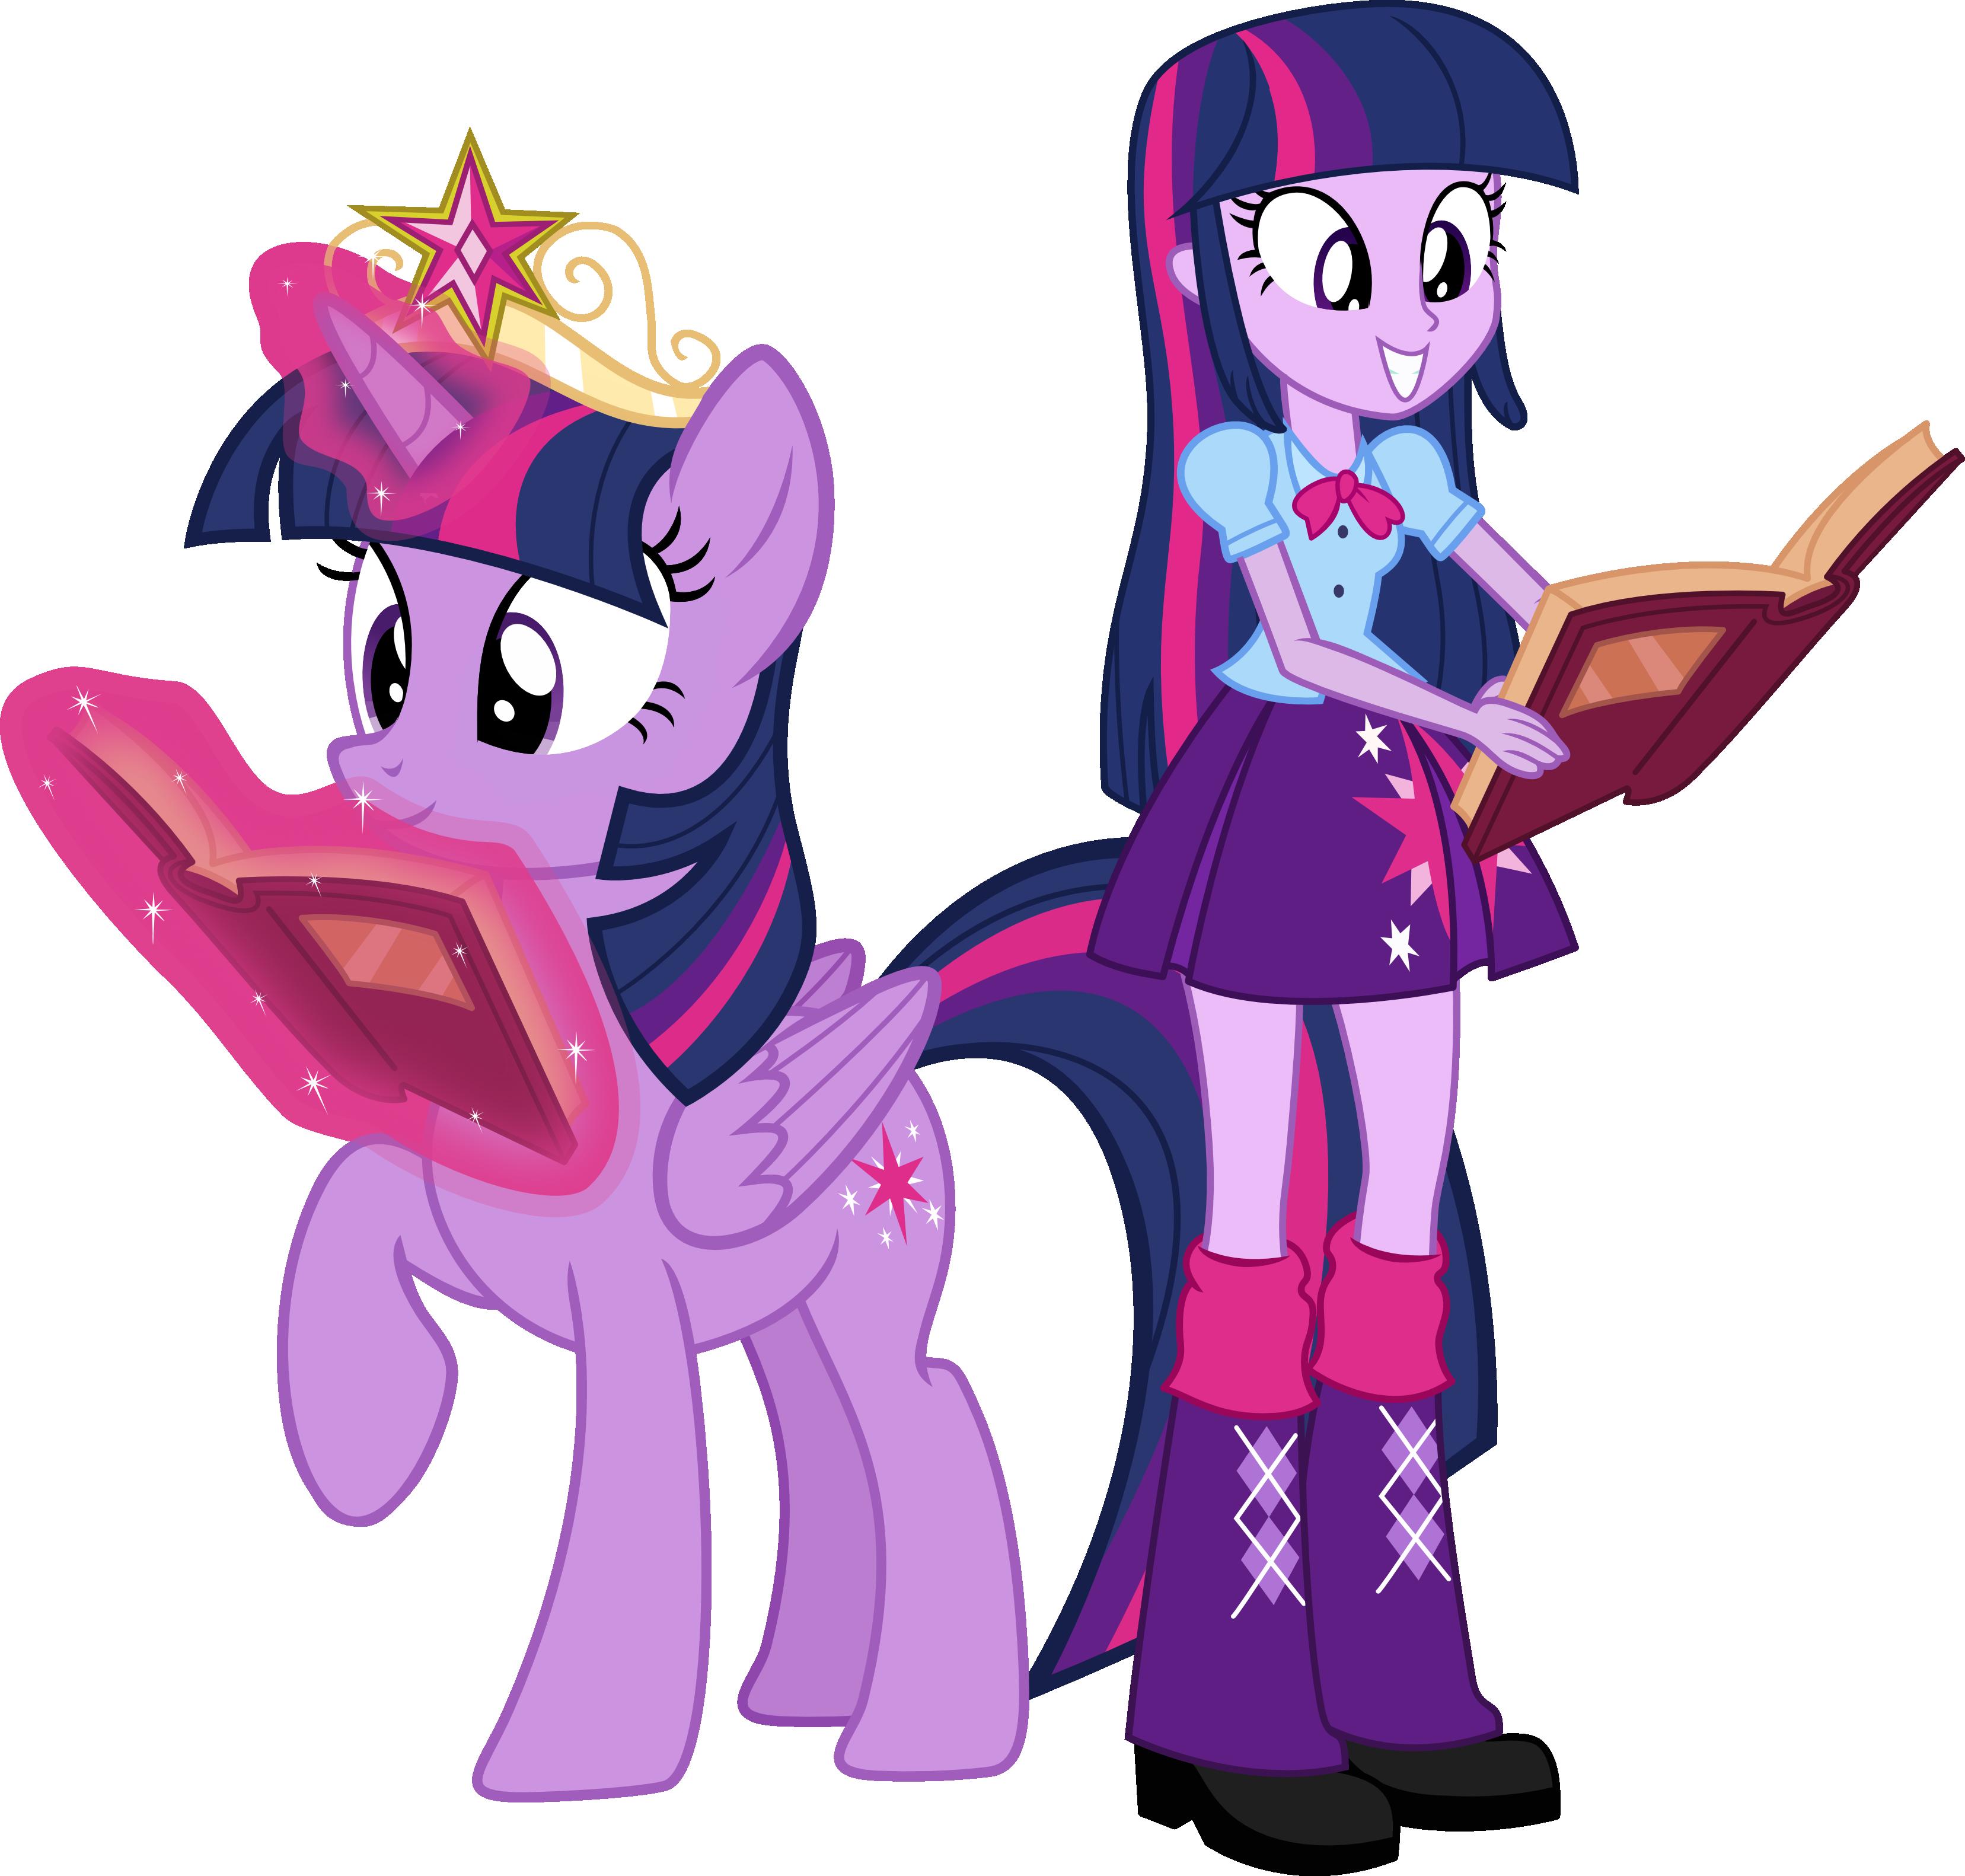 Twilight Sparkle and Twilight Sparkle by Vector-Brony